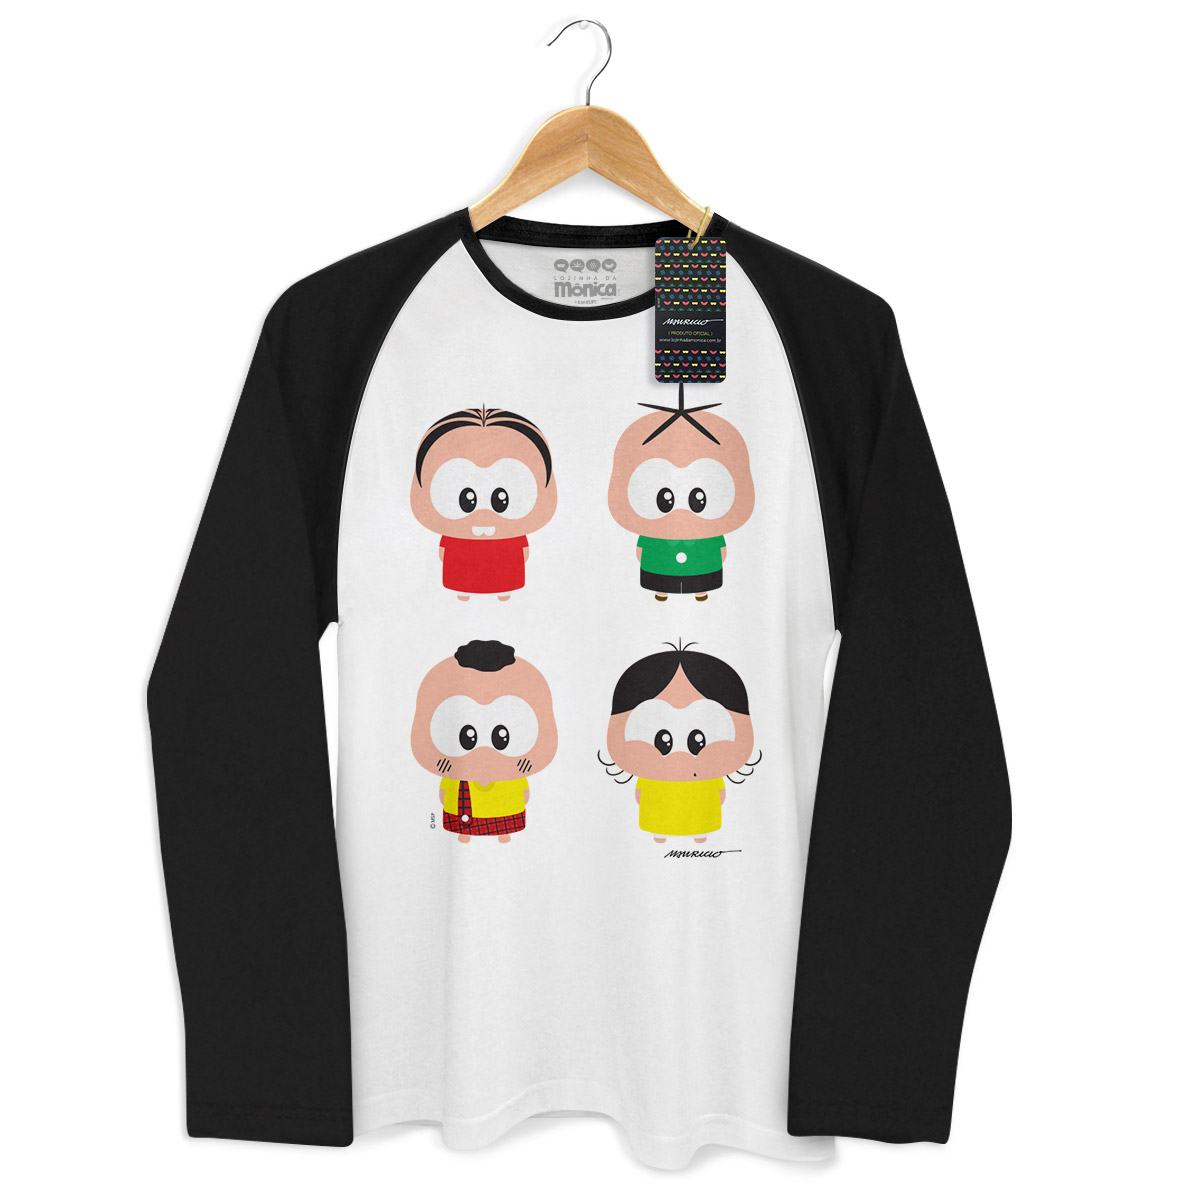 Camiseta Raglan Masculina Turma da Mônica A Turma Toy